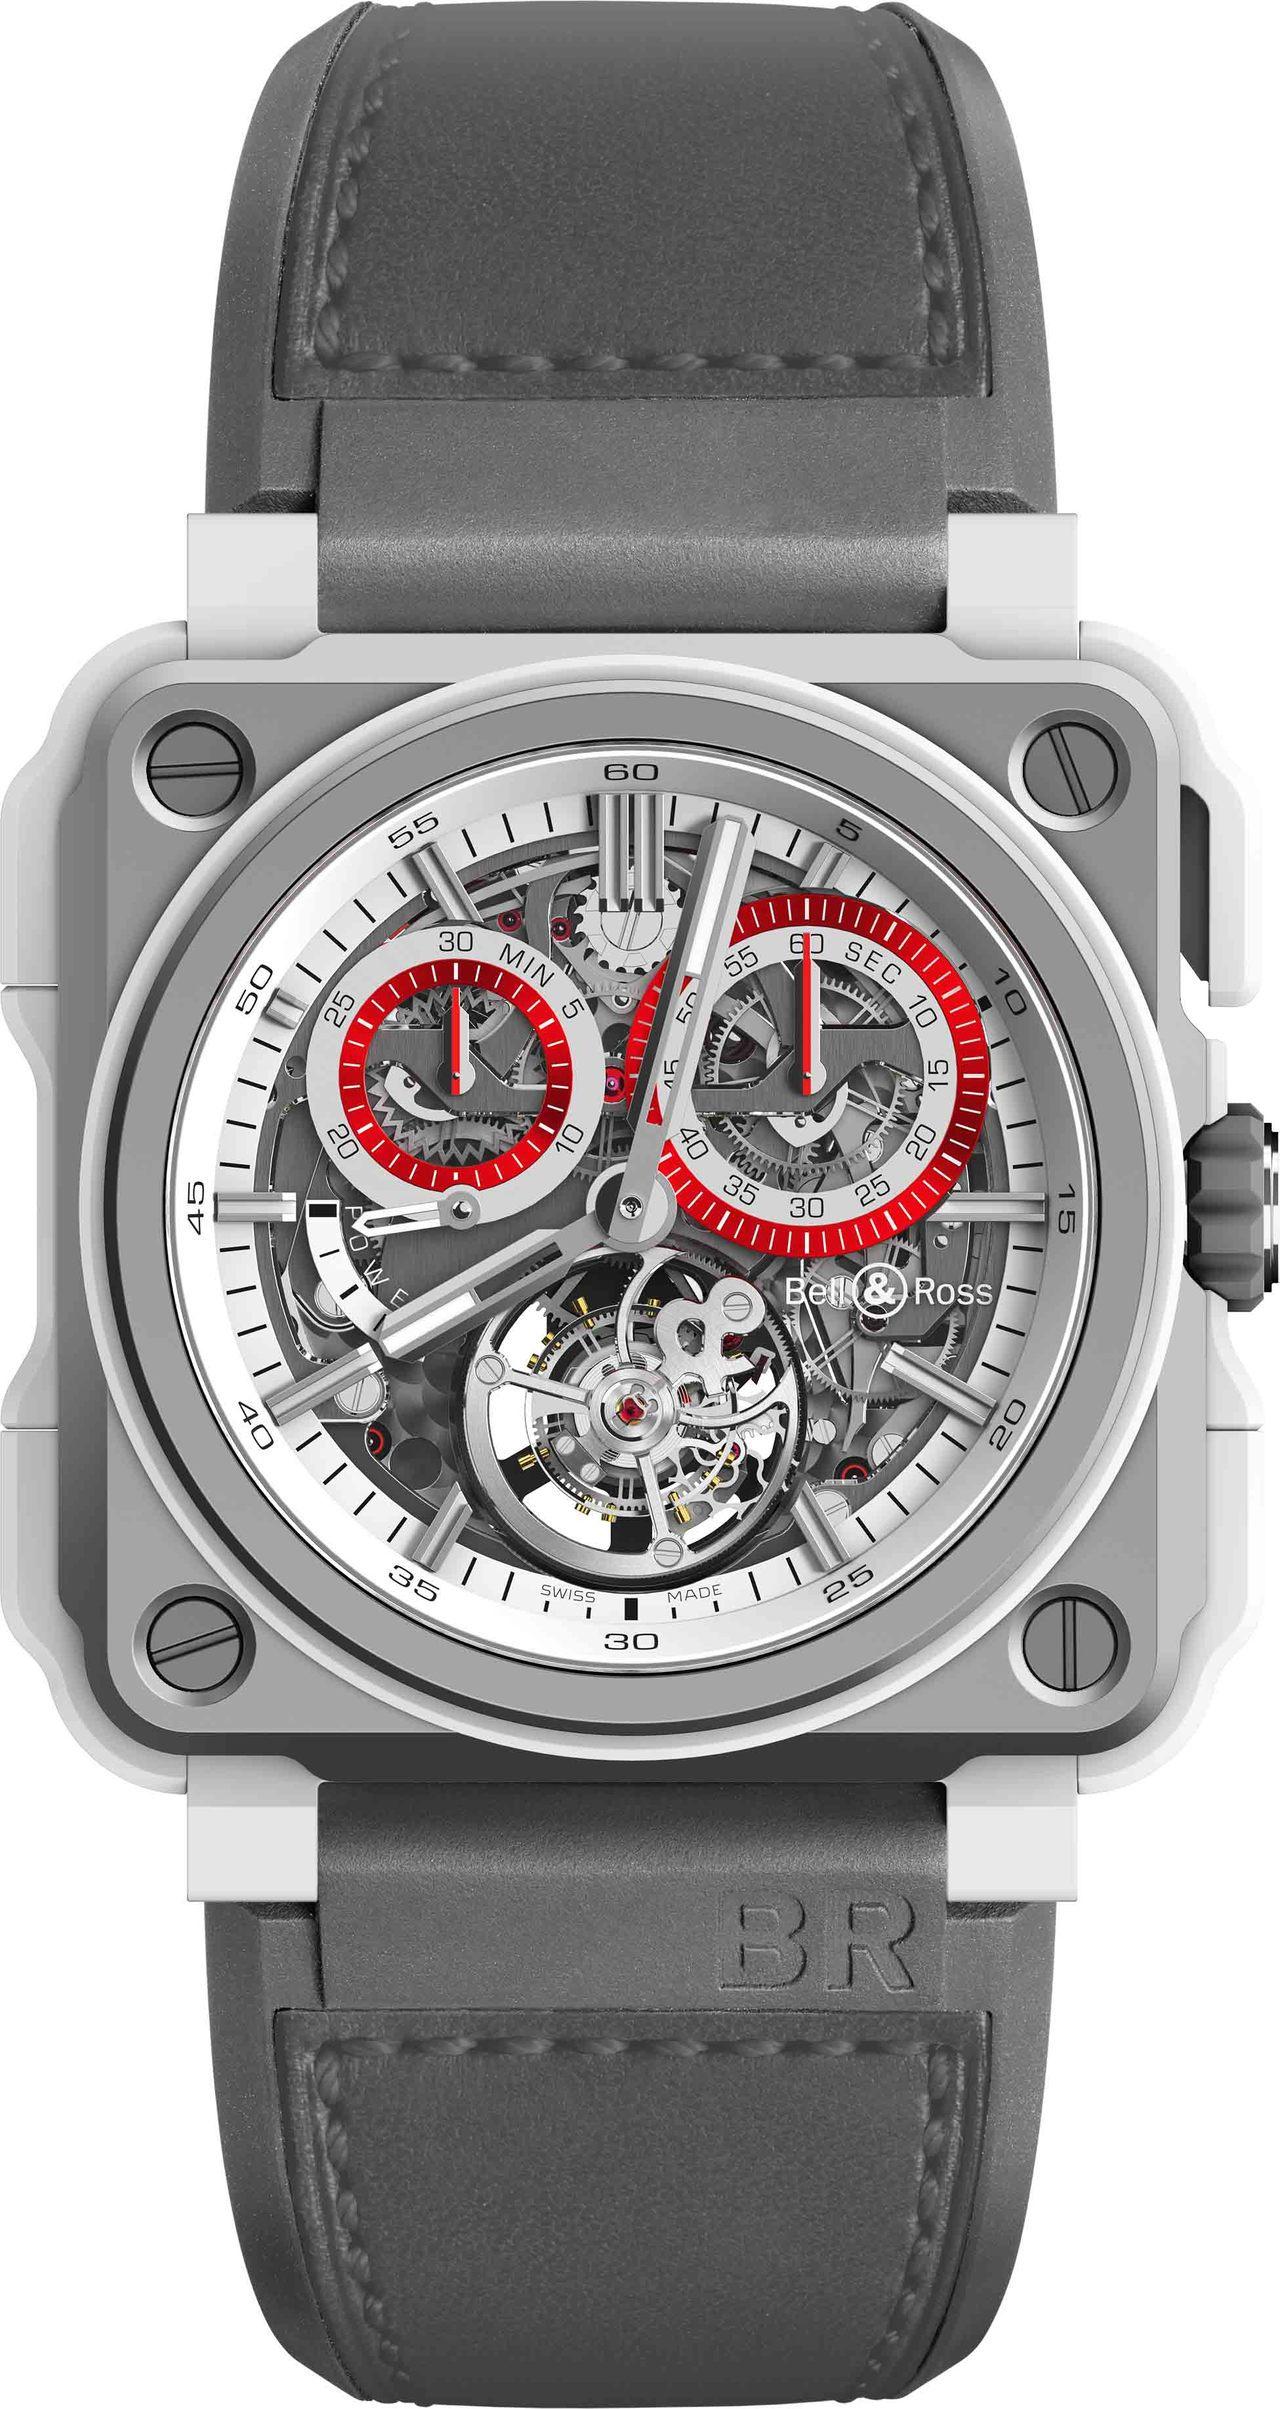 BR-X1 Tourbillon White-Hawk 鏤空陀飛輪計時碼表,限量...